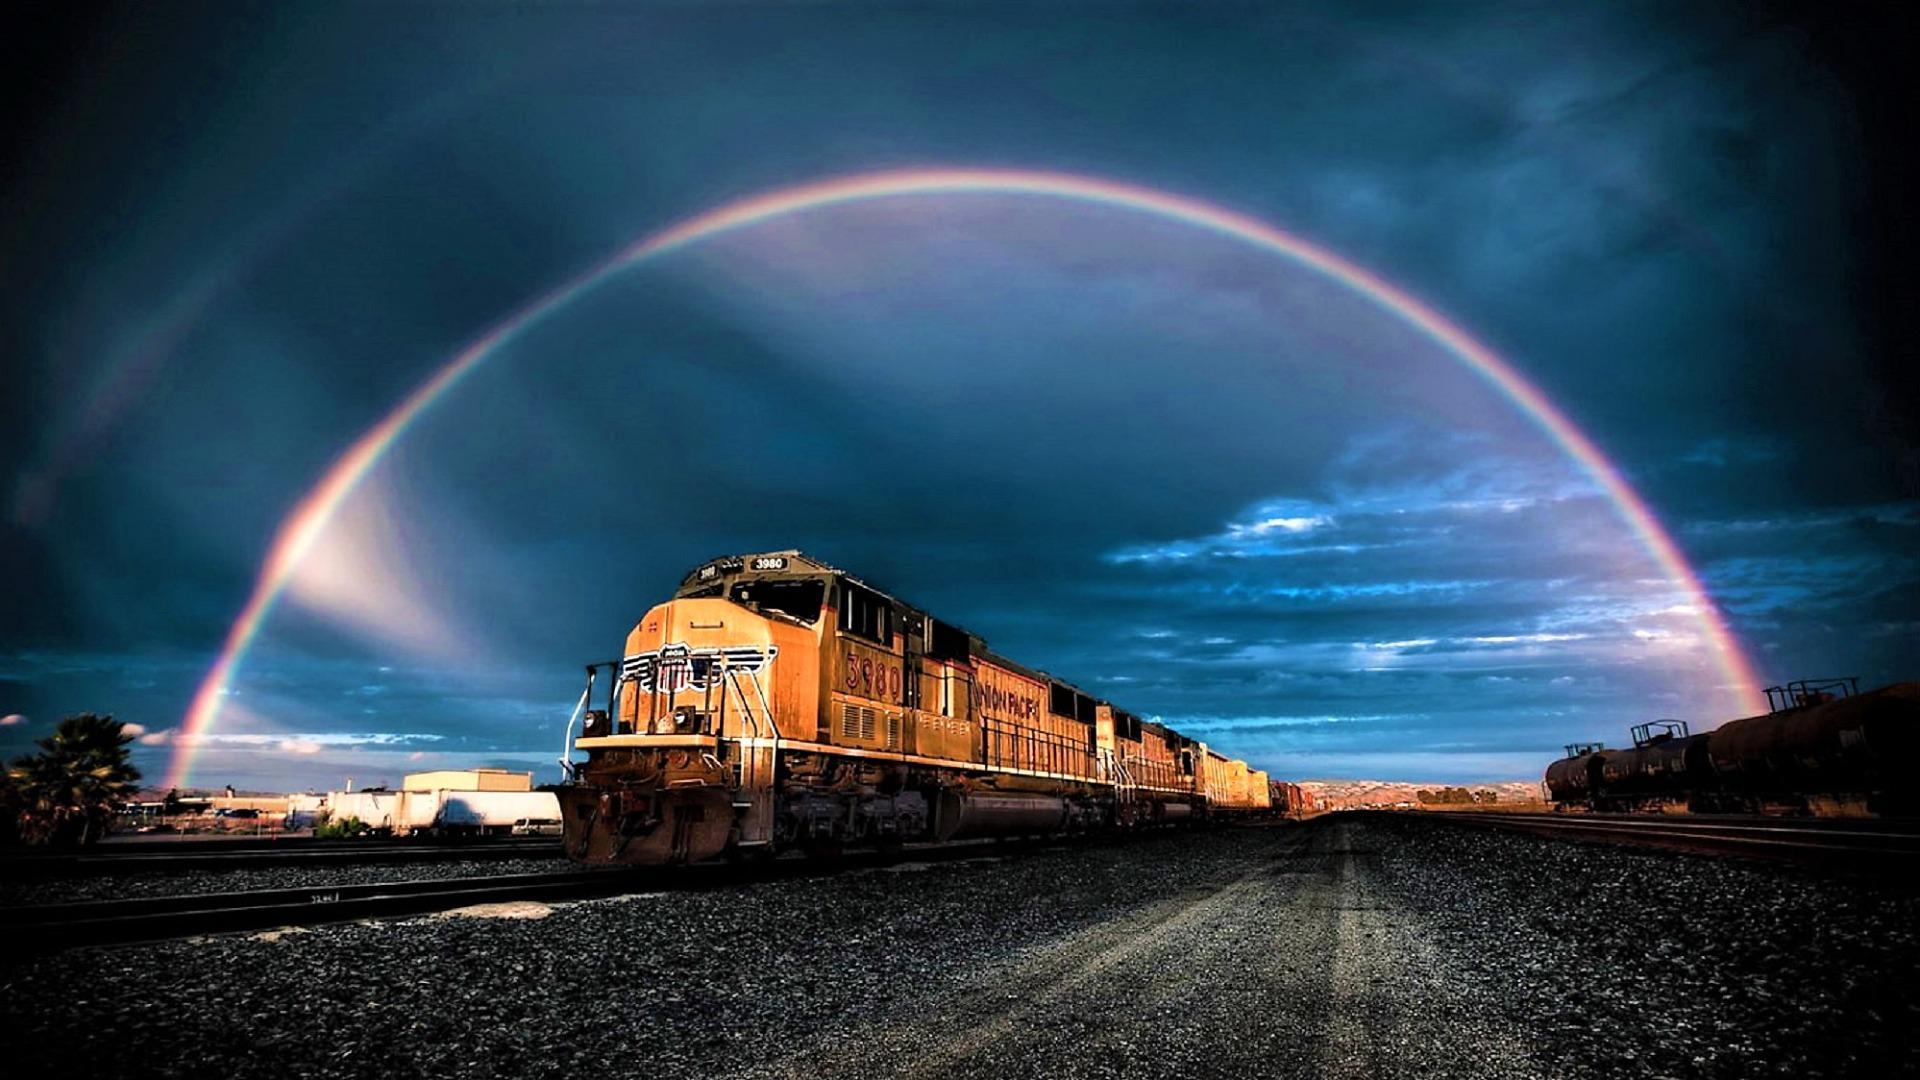 Train under the rainbow wallpaper